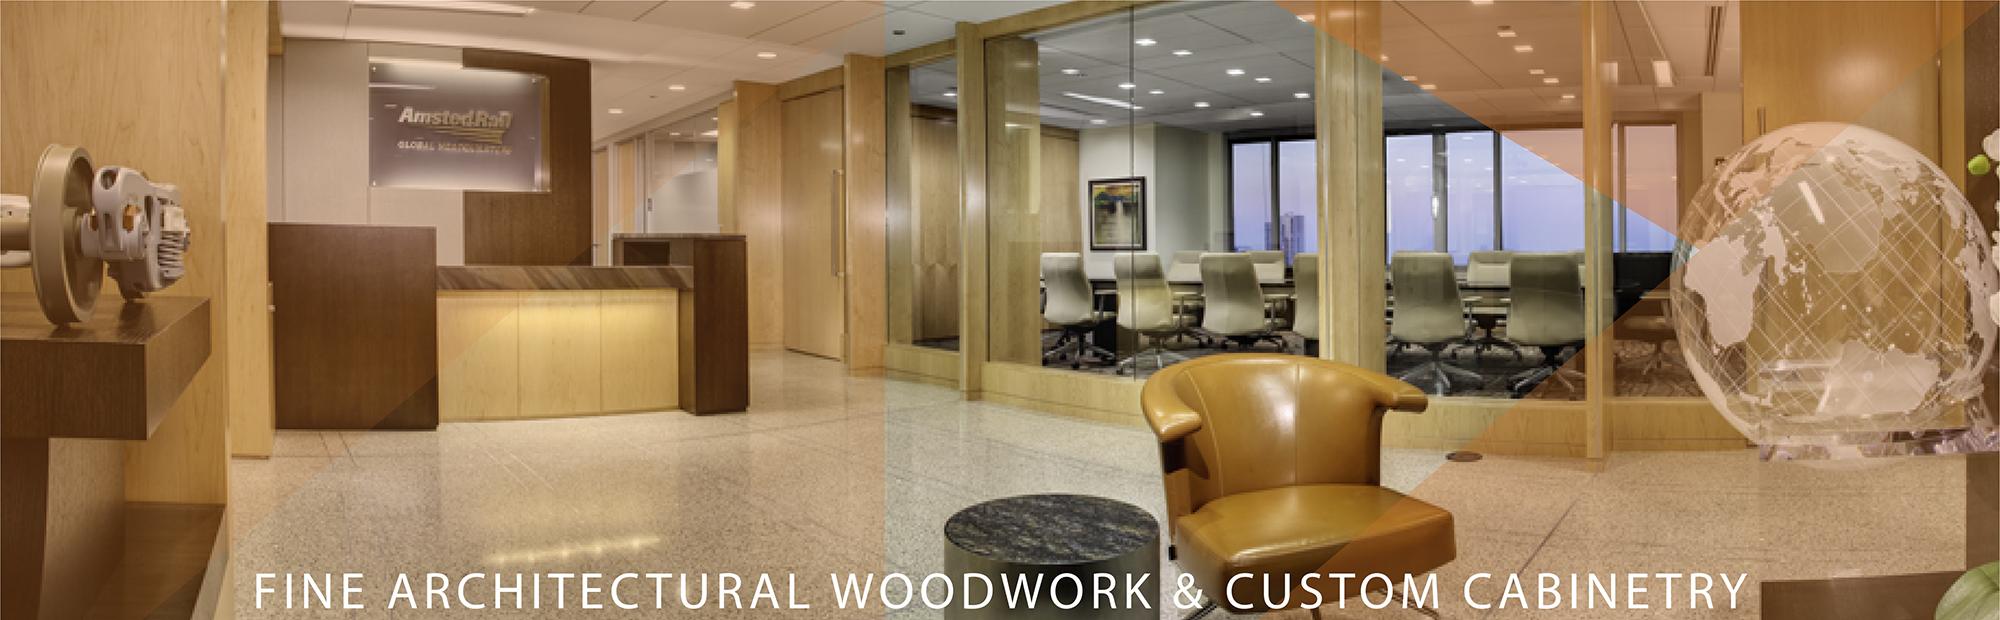 Inter Ocean Cabinet Company | FINE ARCHITECTURAL WOODWORK U0026 CUSTOM CABINETRY